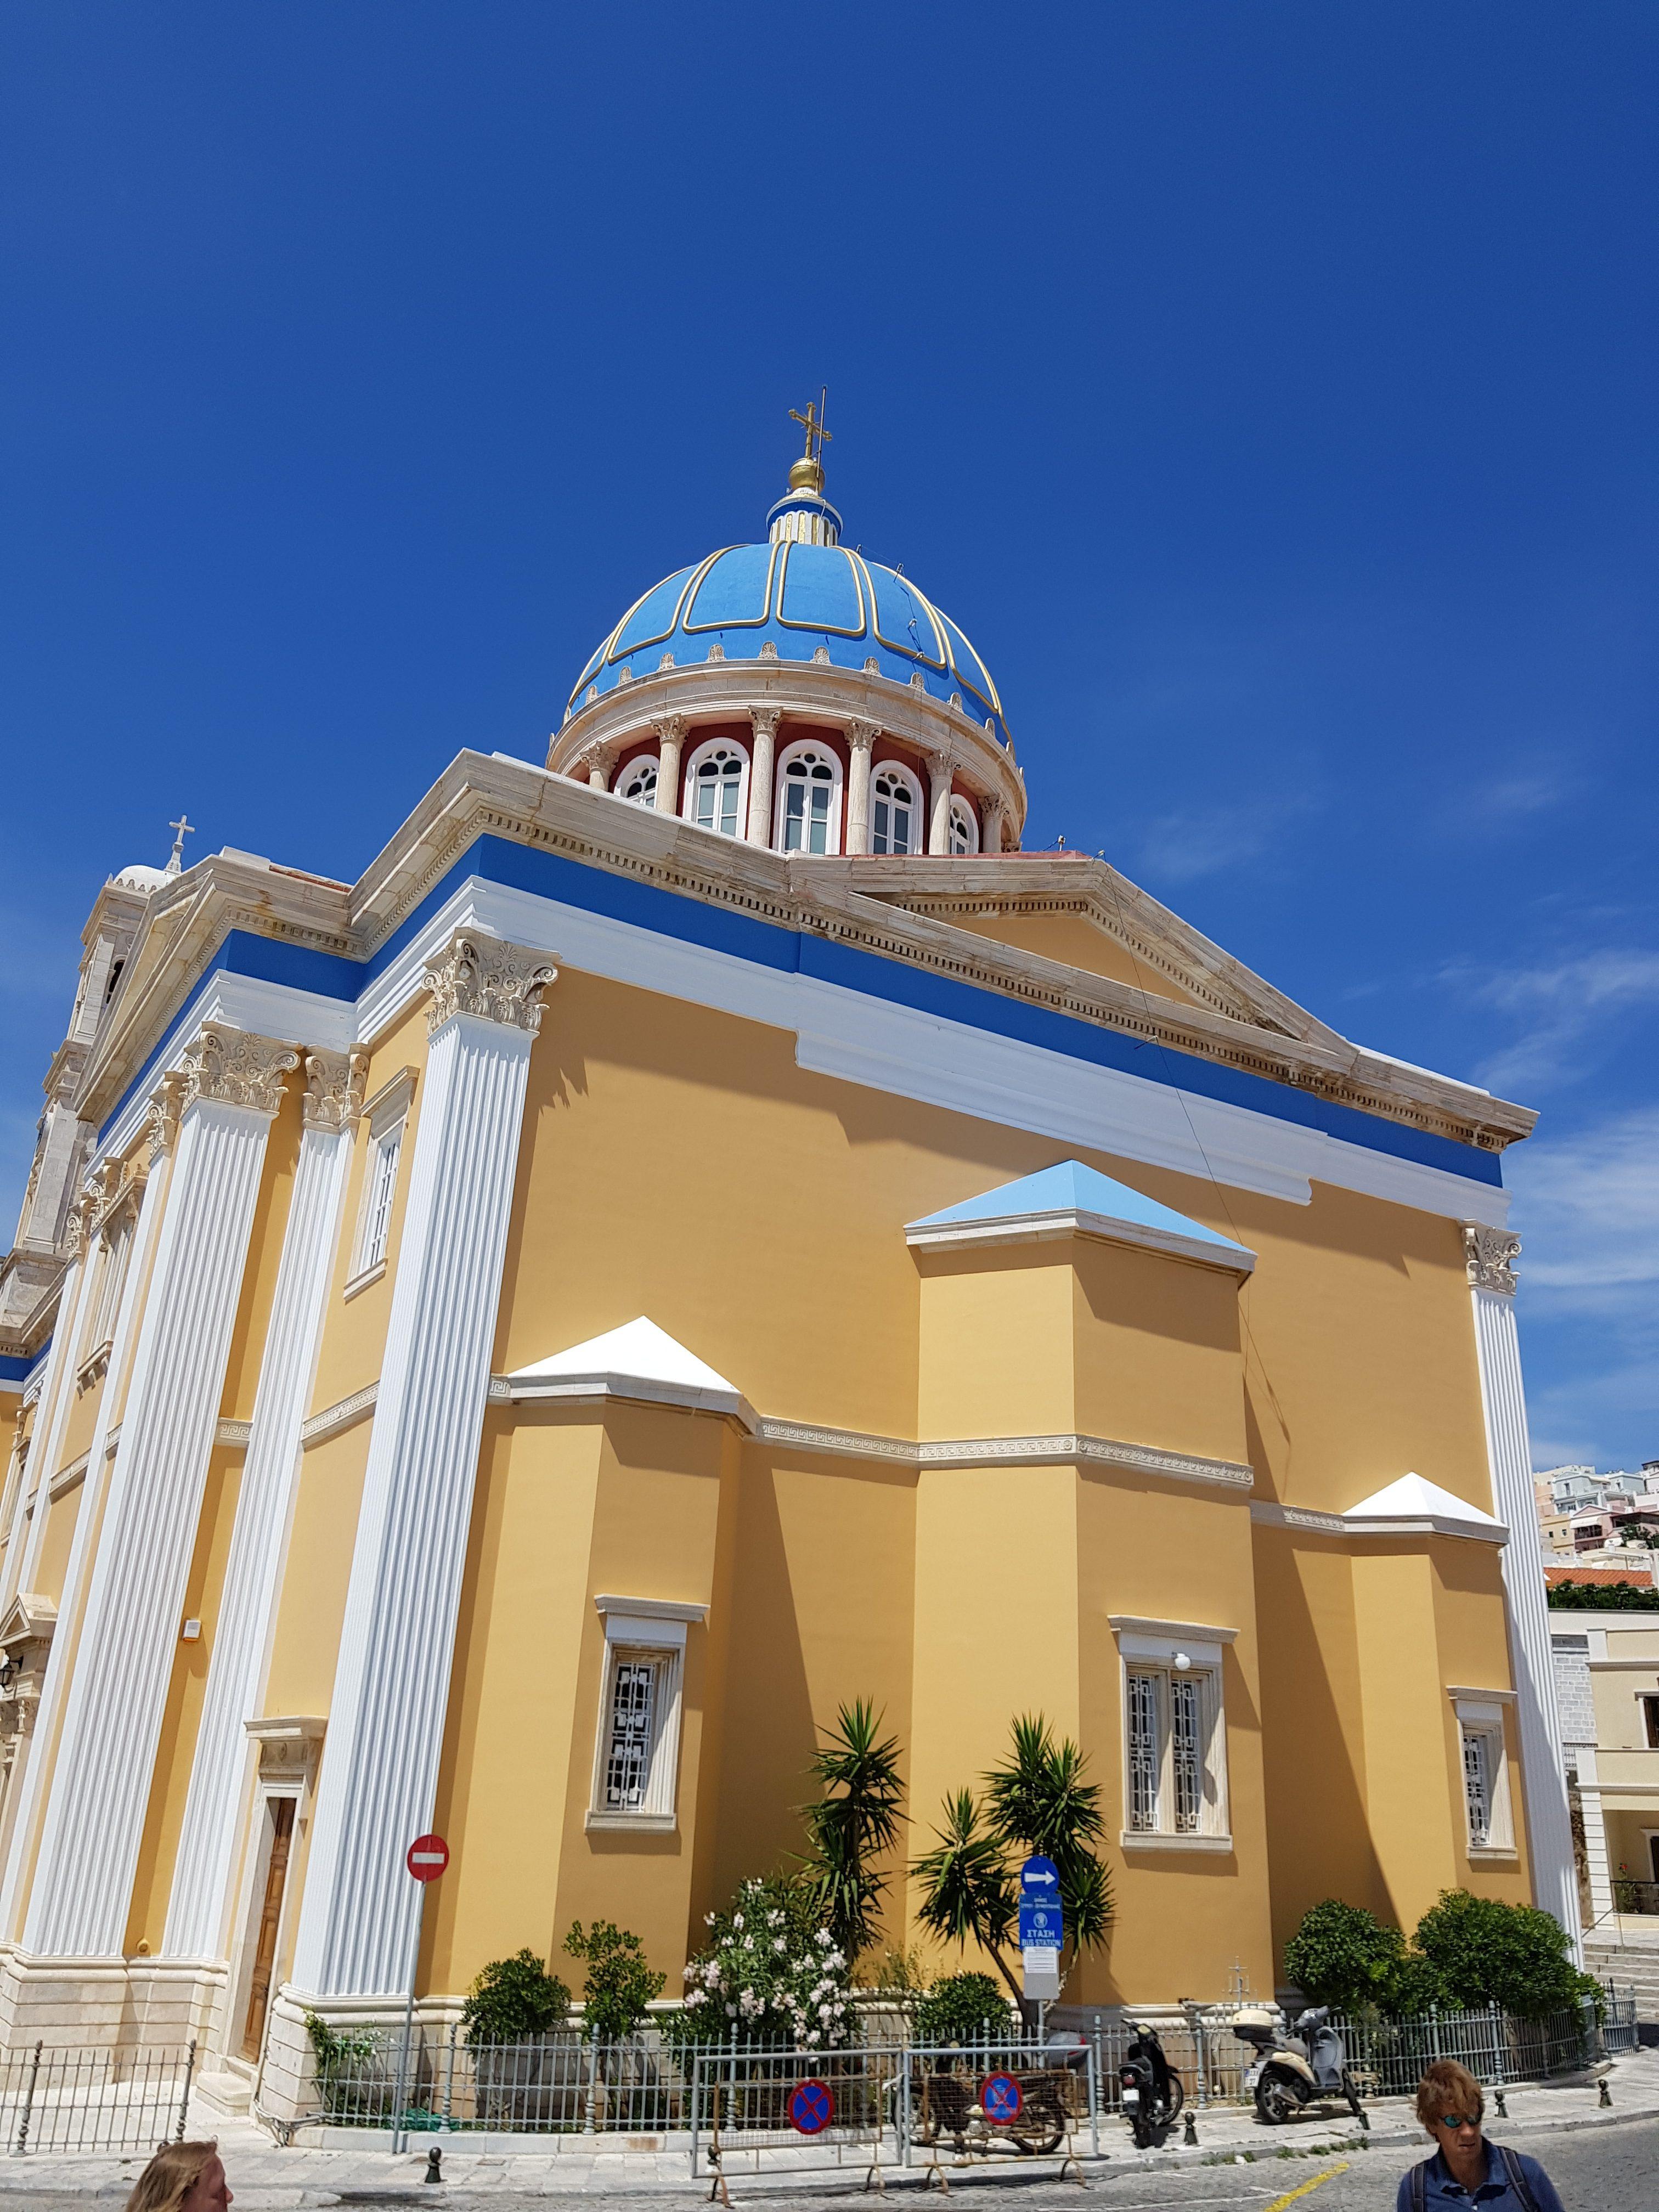 Greek Orthodox church of Saint Nicholas, Syros